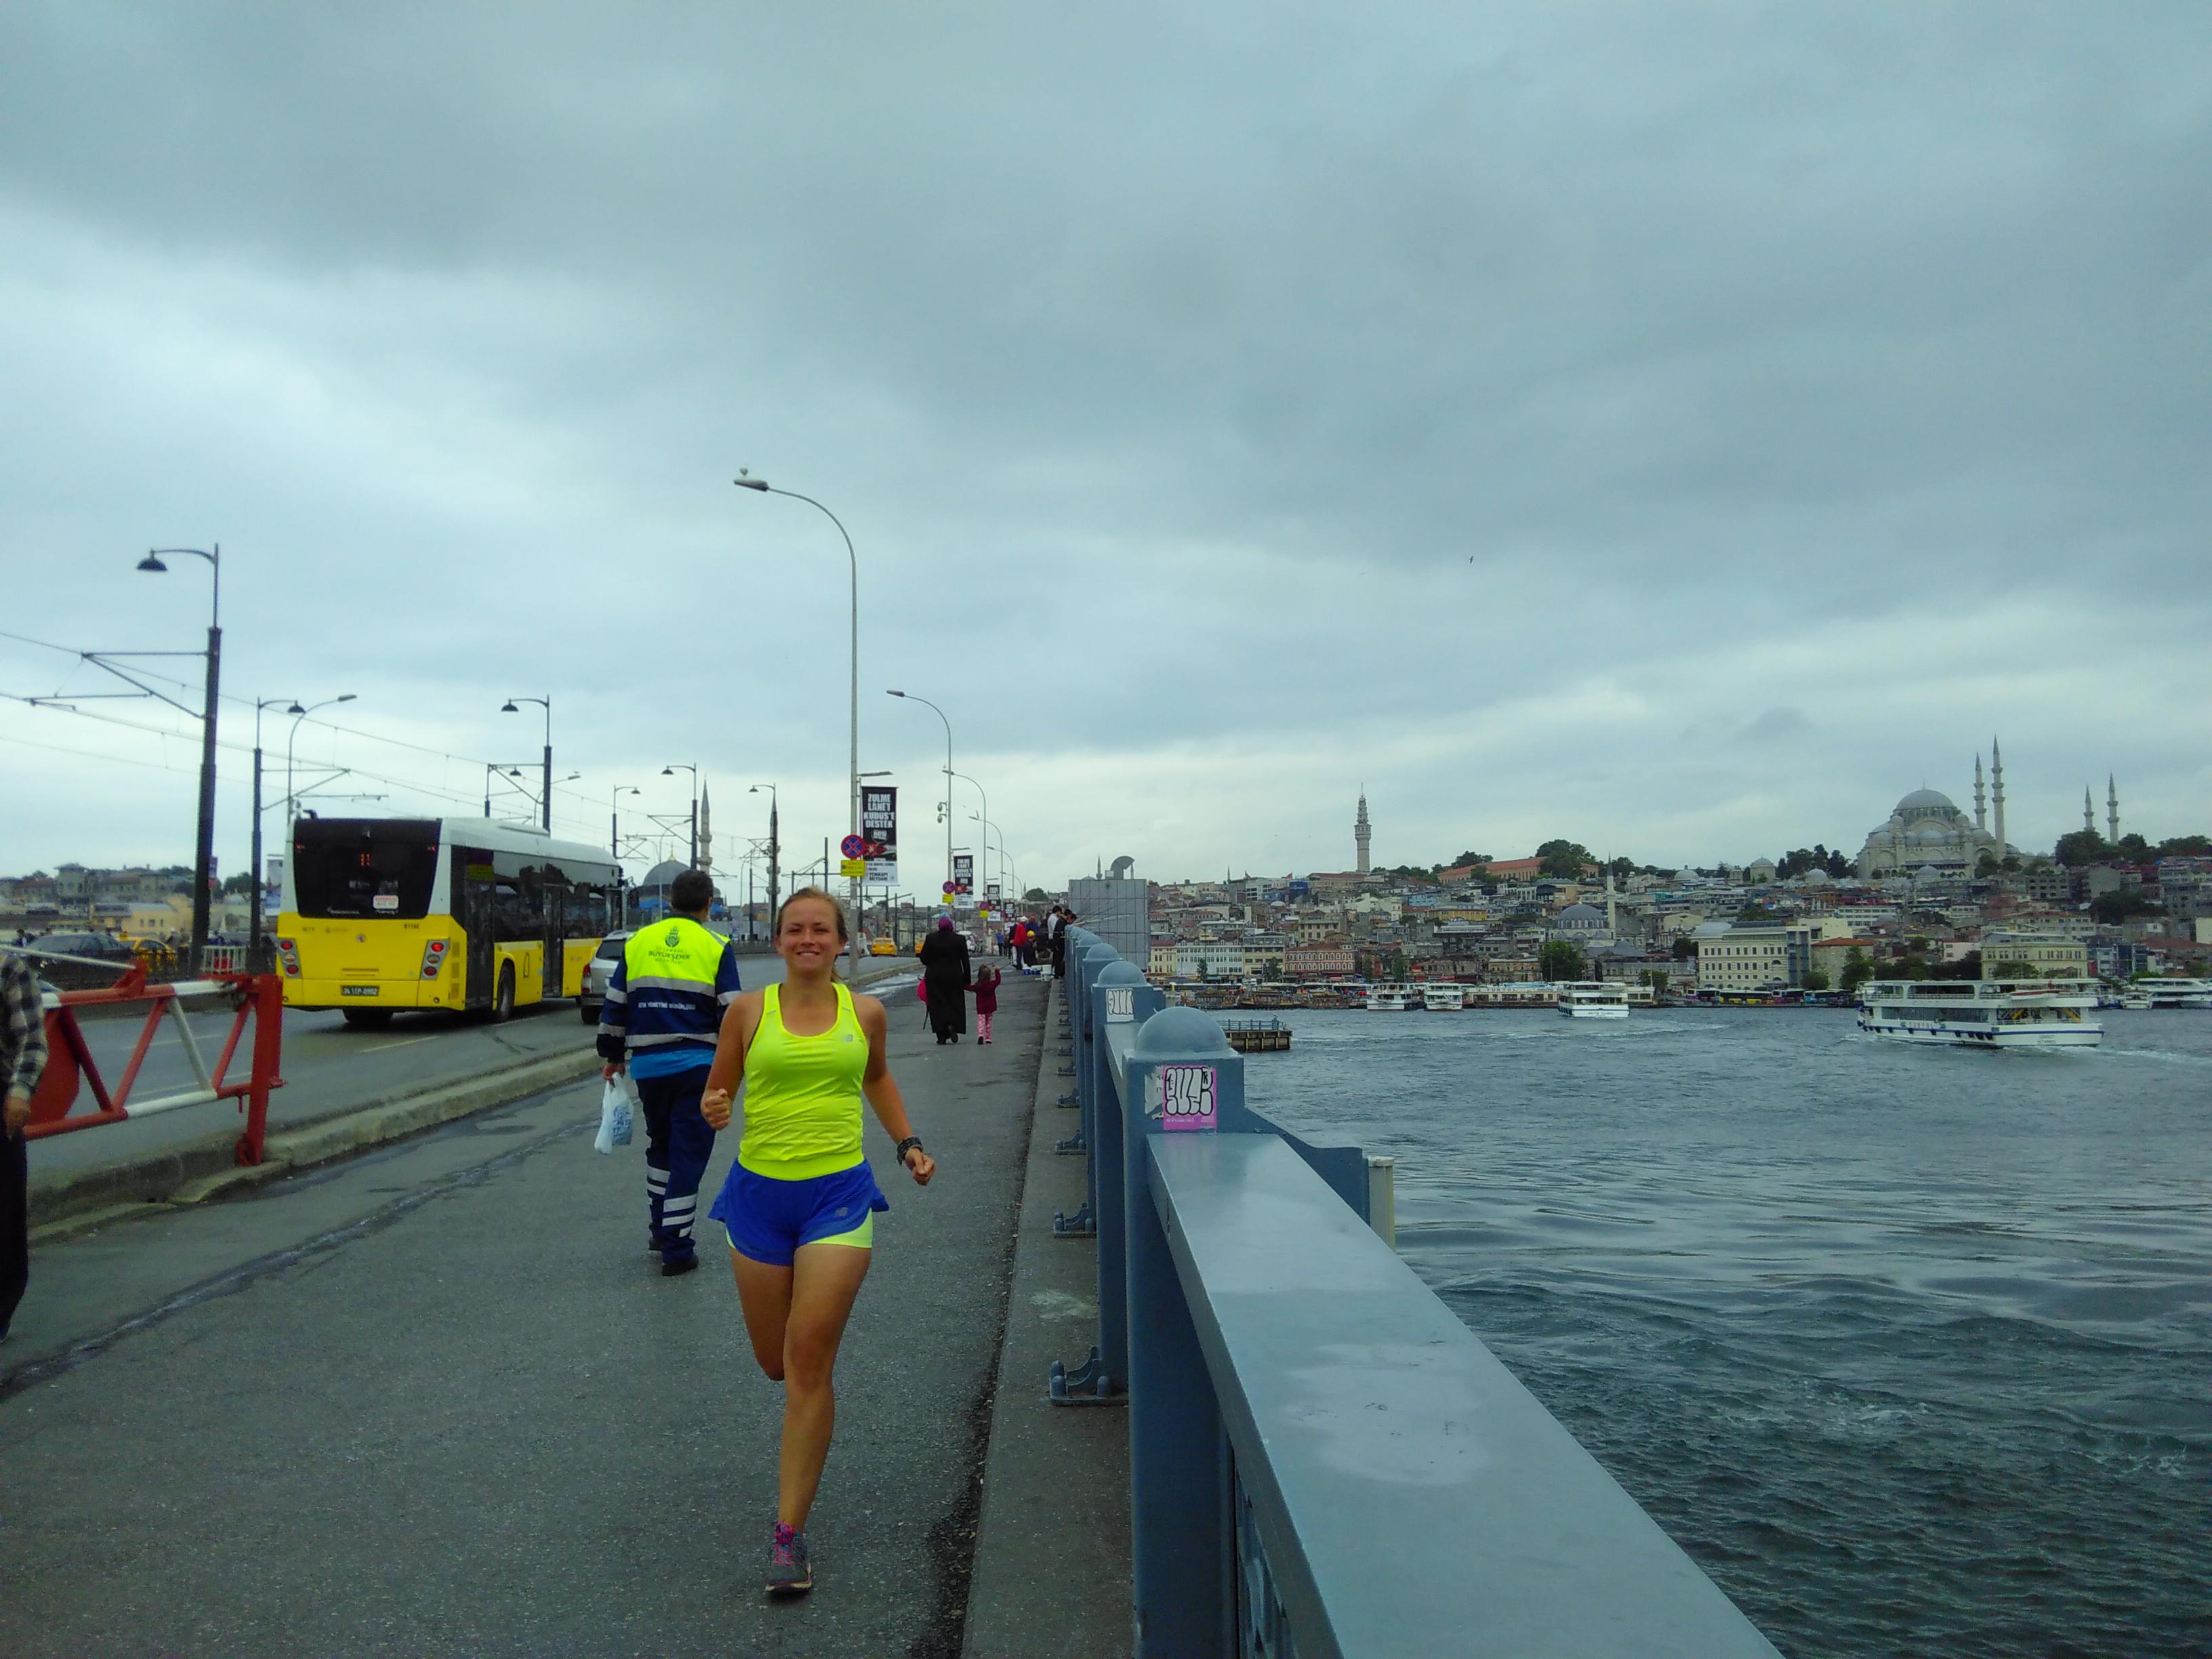 hardlopen in istanbul over de galatabrug